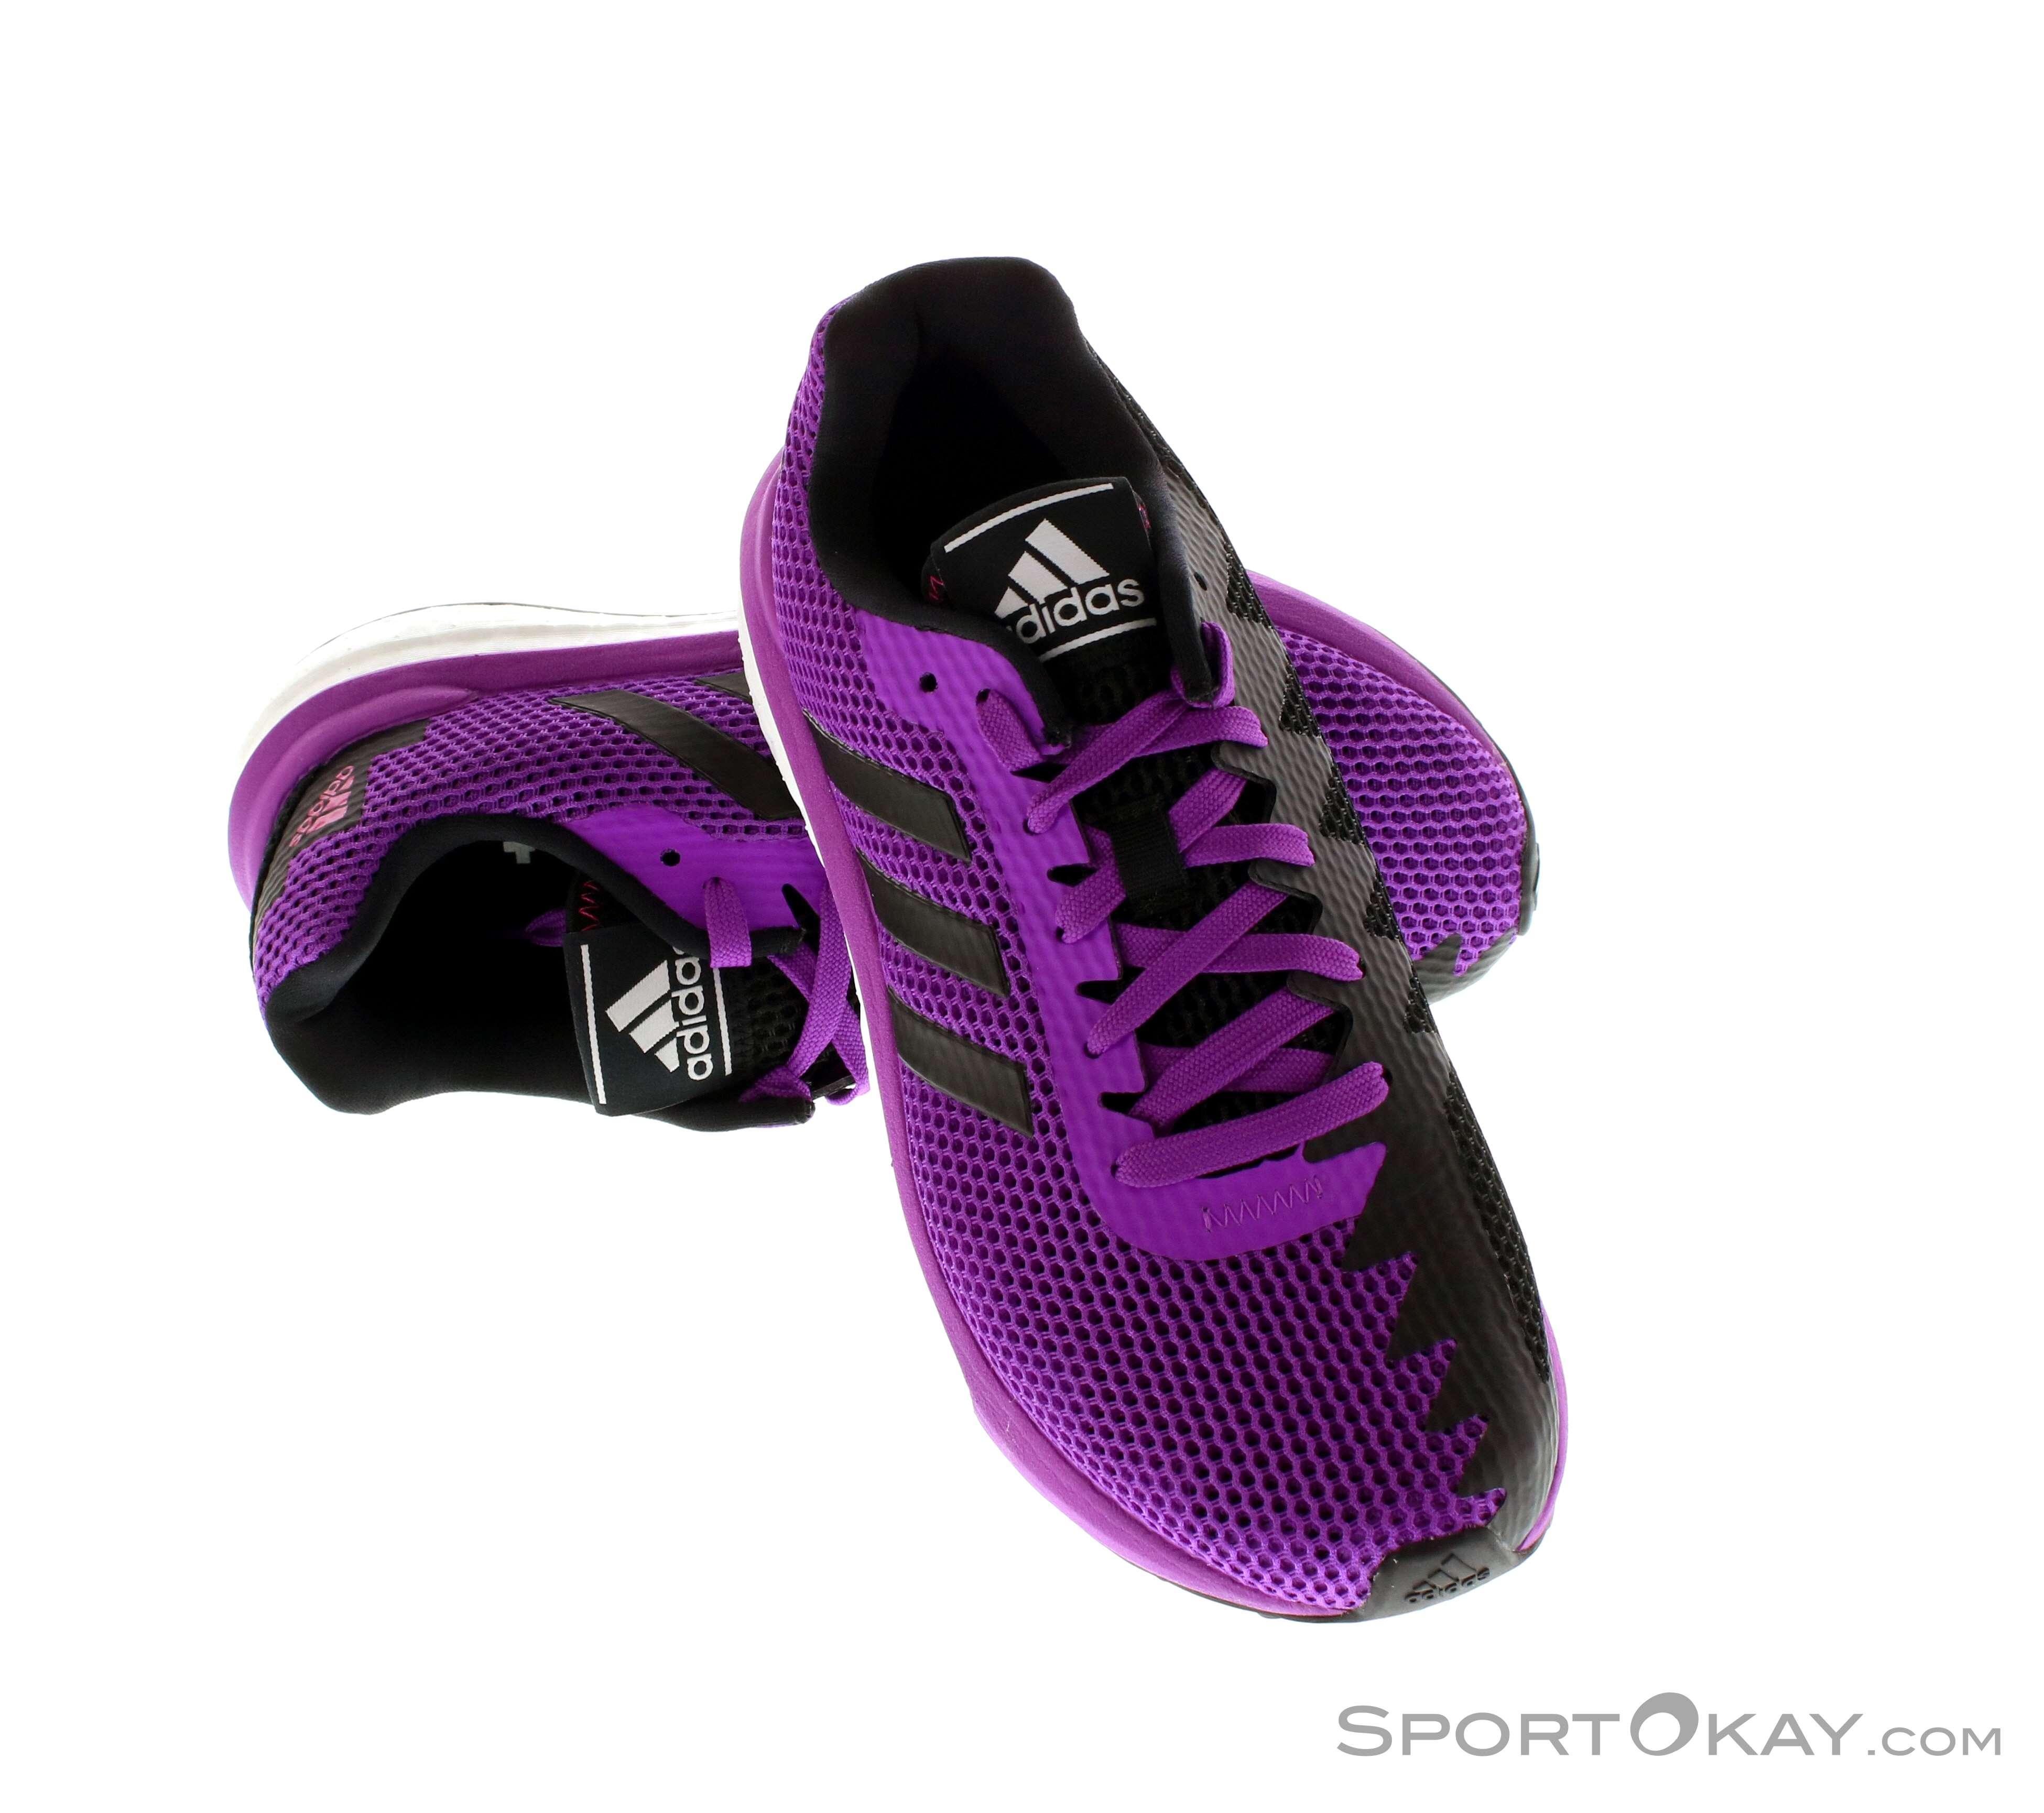 b992c7c9bff adidas Vengeful Womens Running Shoes - All-Round Running Shoes ...